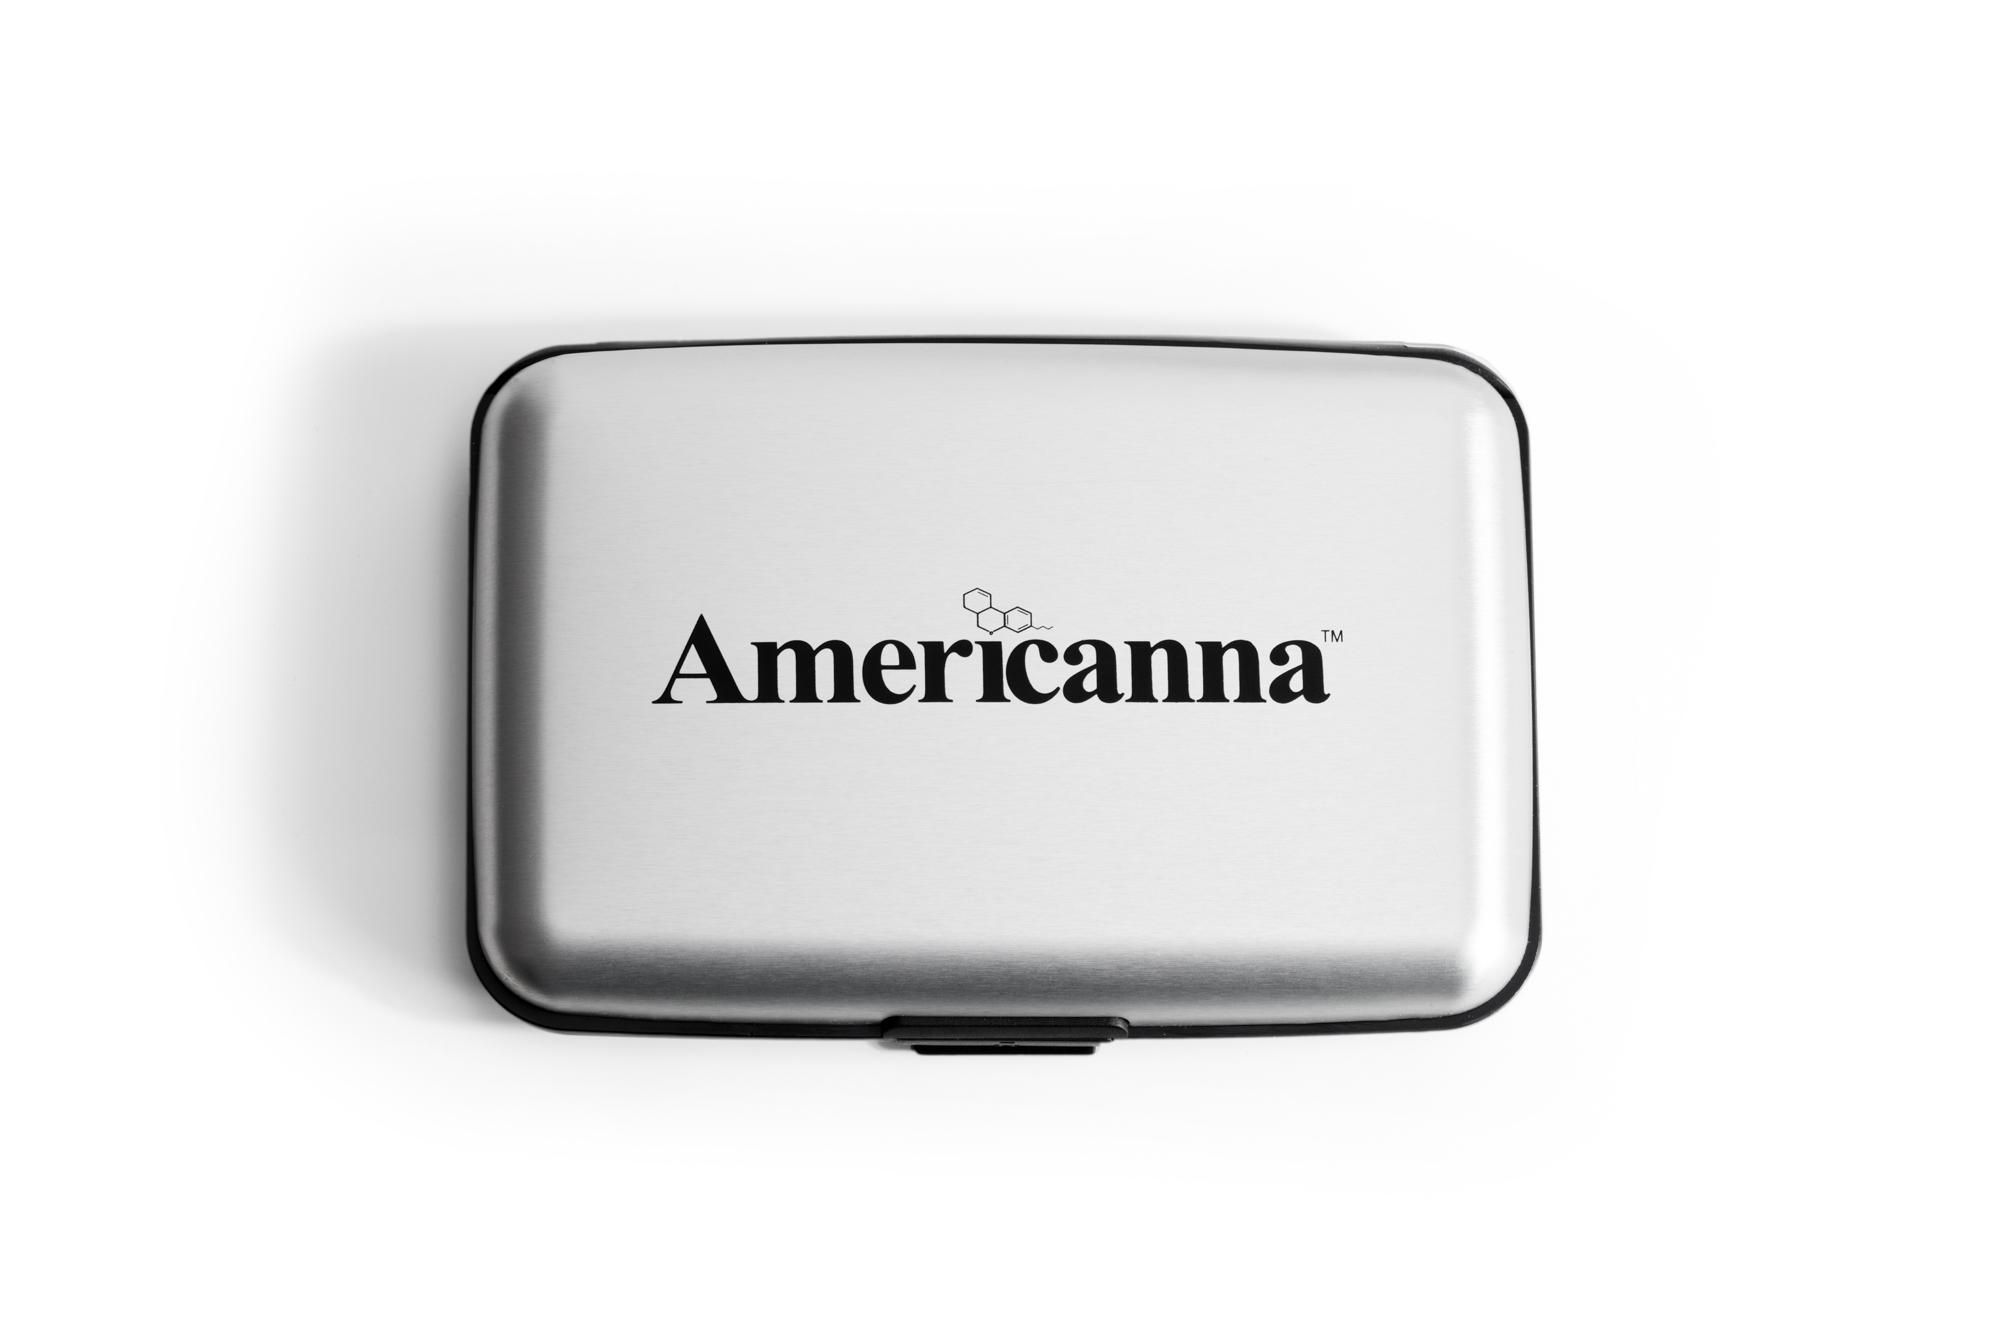 Americanna starter kit - travel cannabis